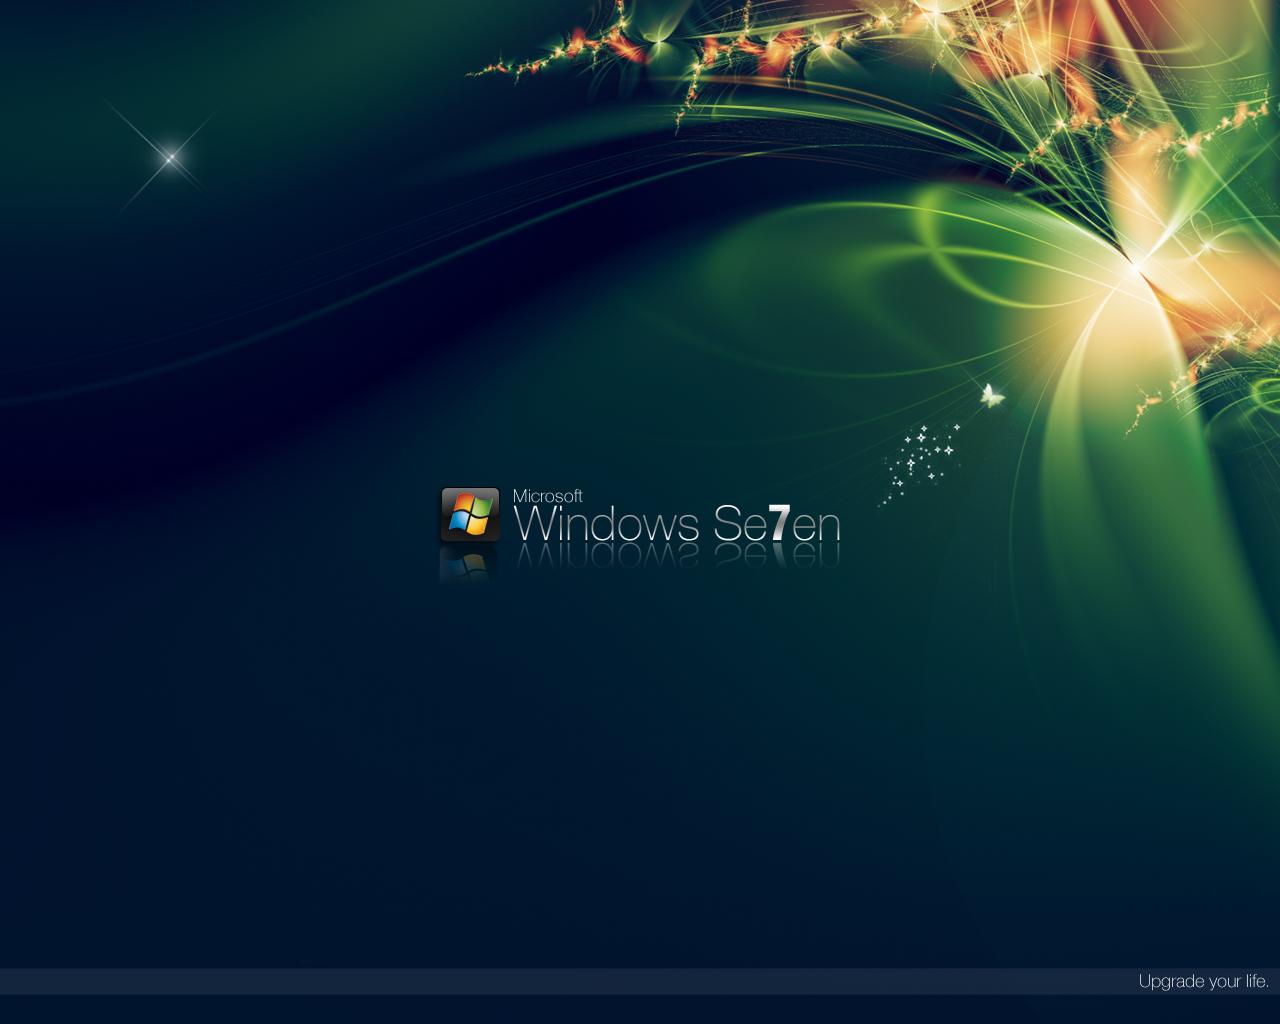 Windowswallpaper on Windows 7 Hd Wallpaper   Computer   Systems   374645